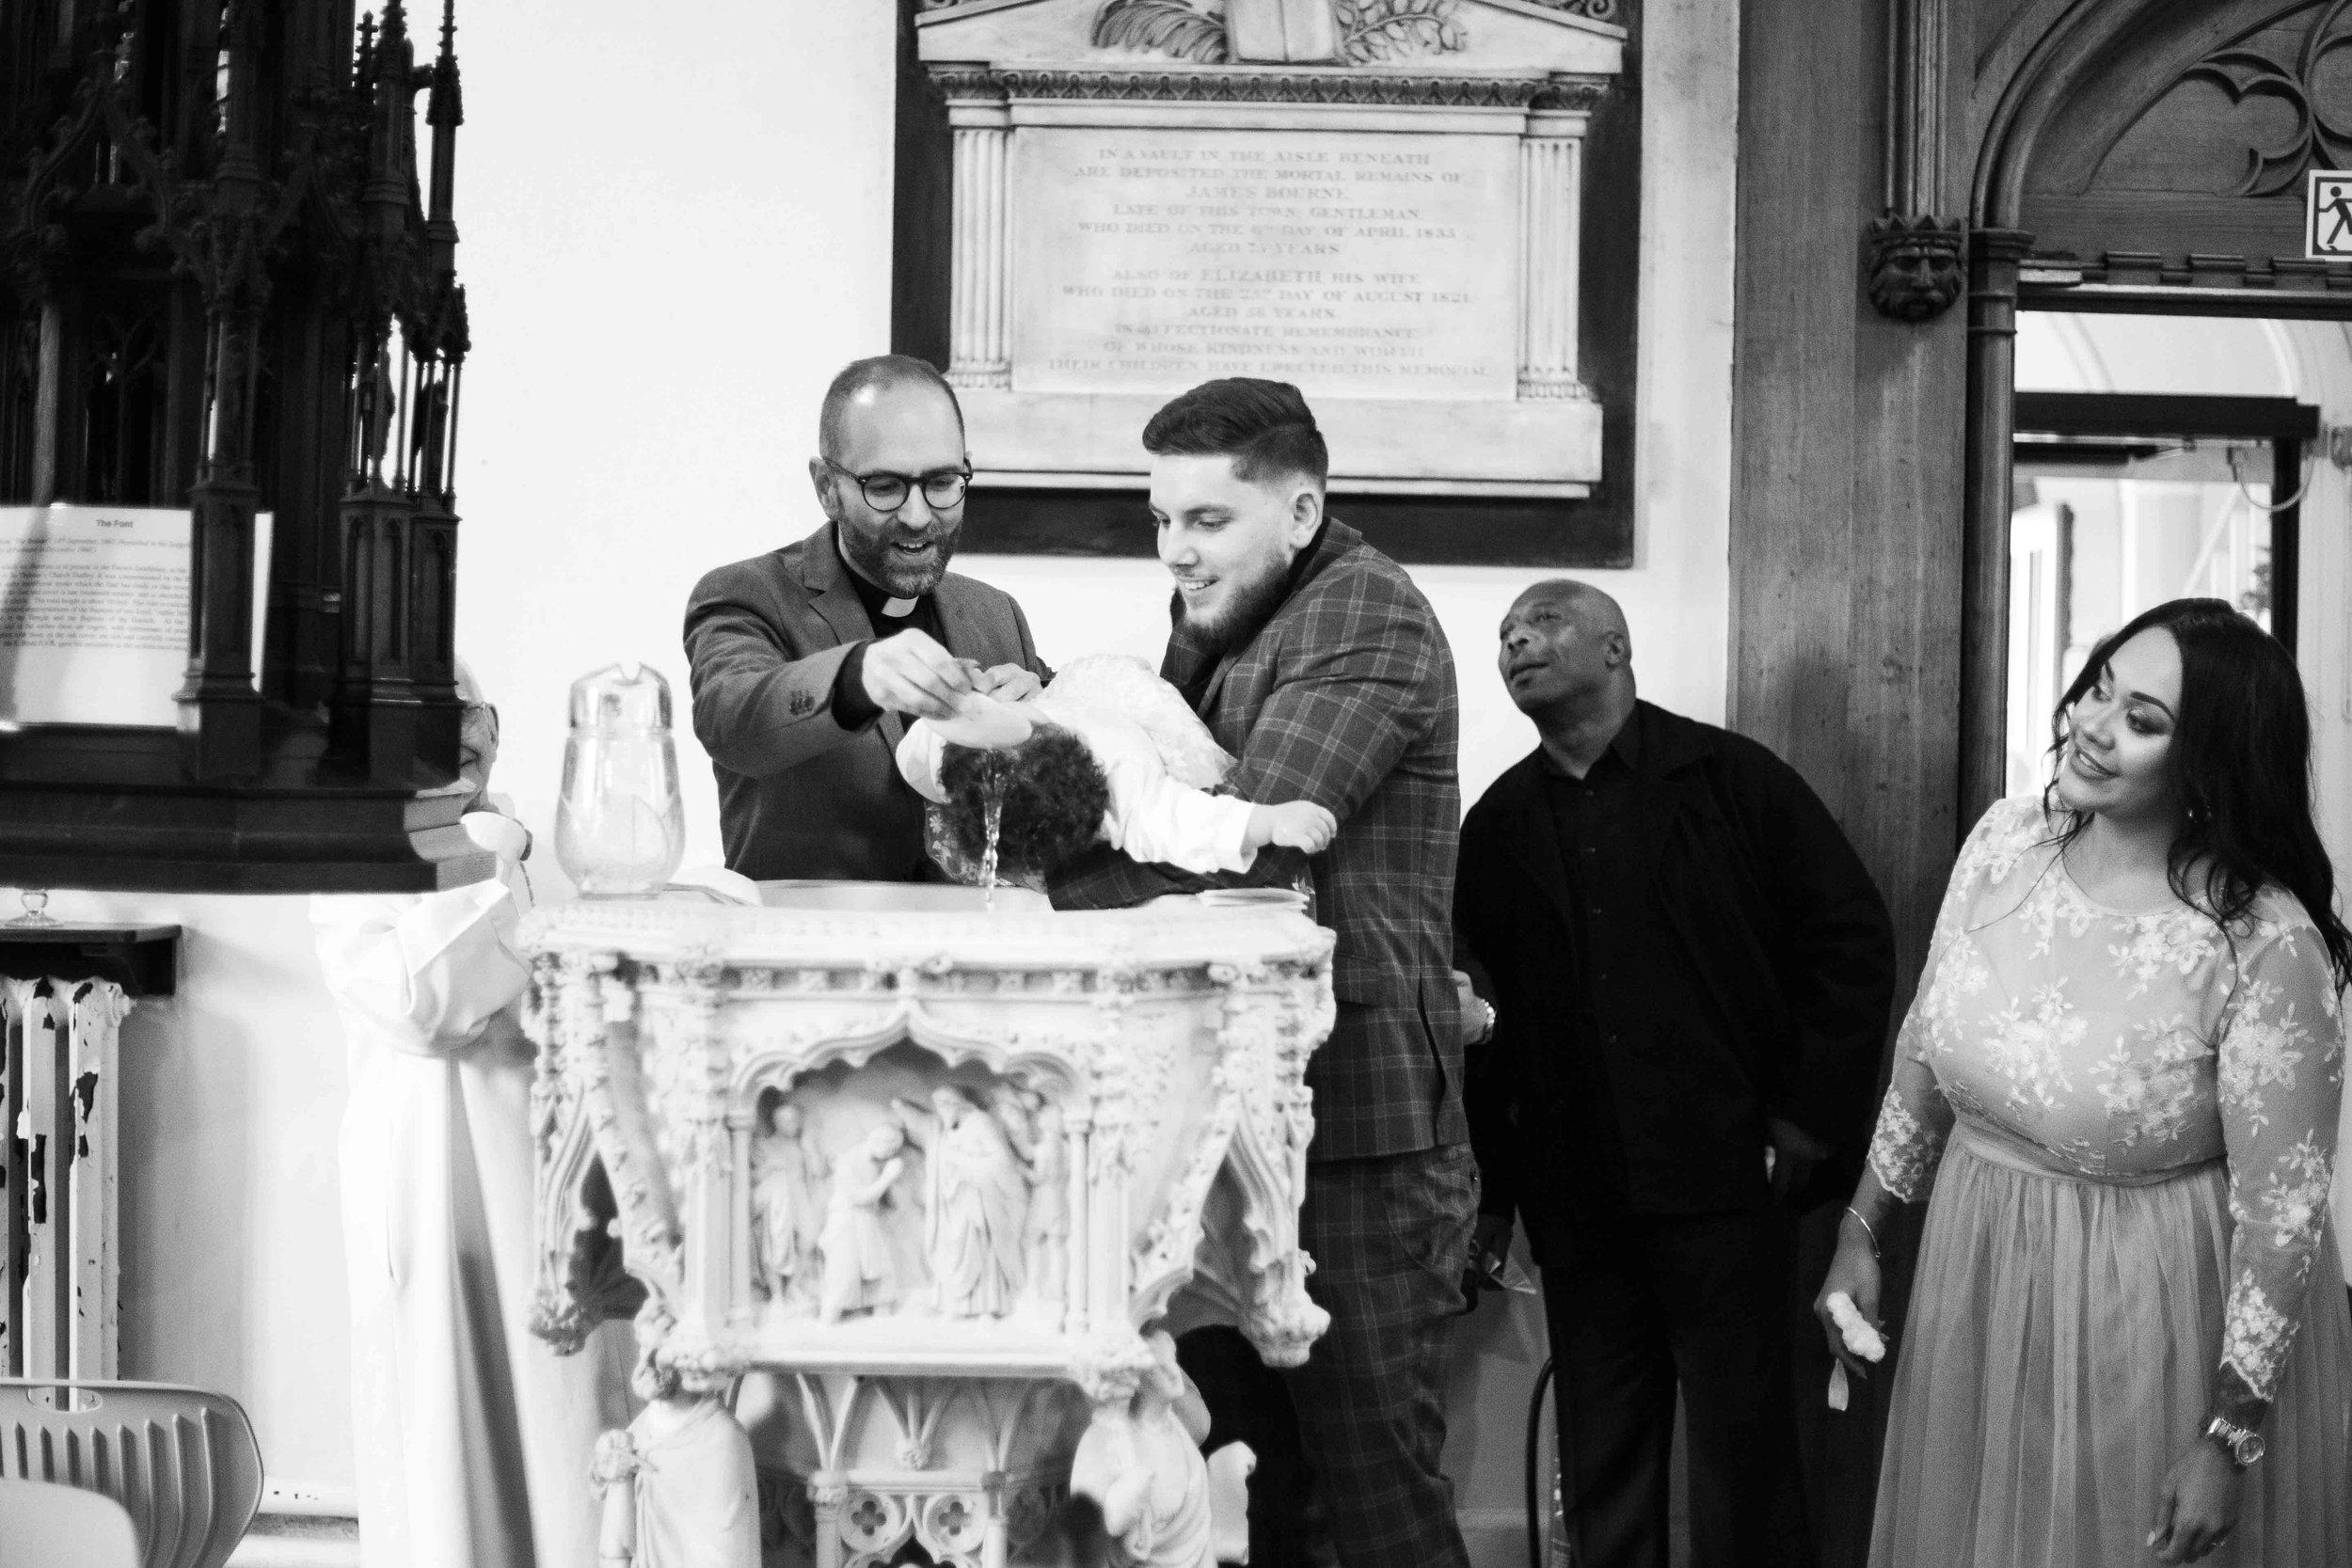 Lea-cooper-photography-christening-photographer-baptism-wolverhampton-wednesbury-walsall-willenhall-dudley-church-chapel-event-photography-12.jpg